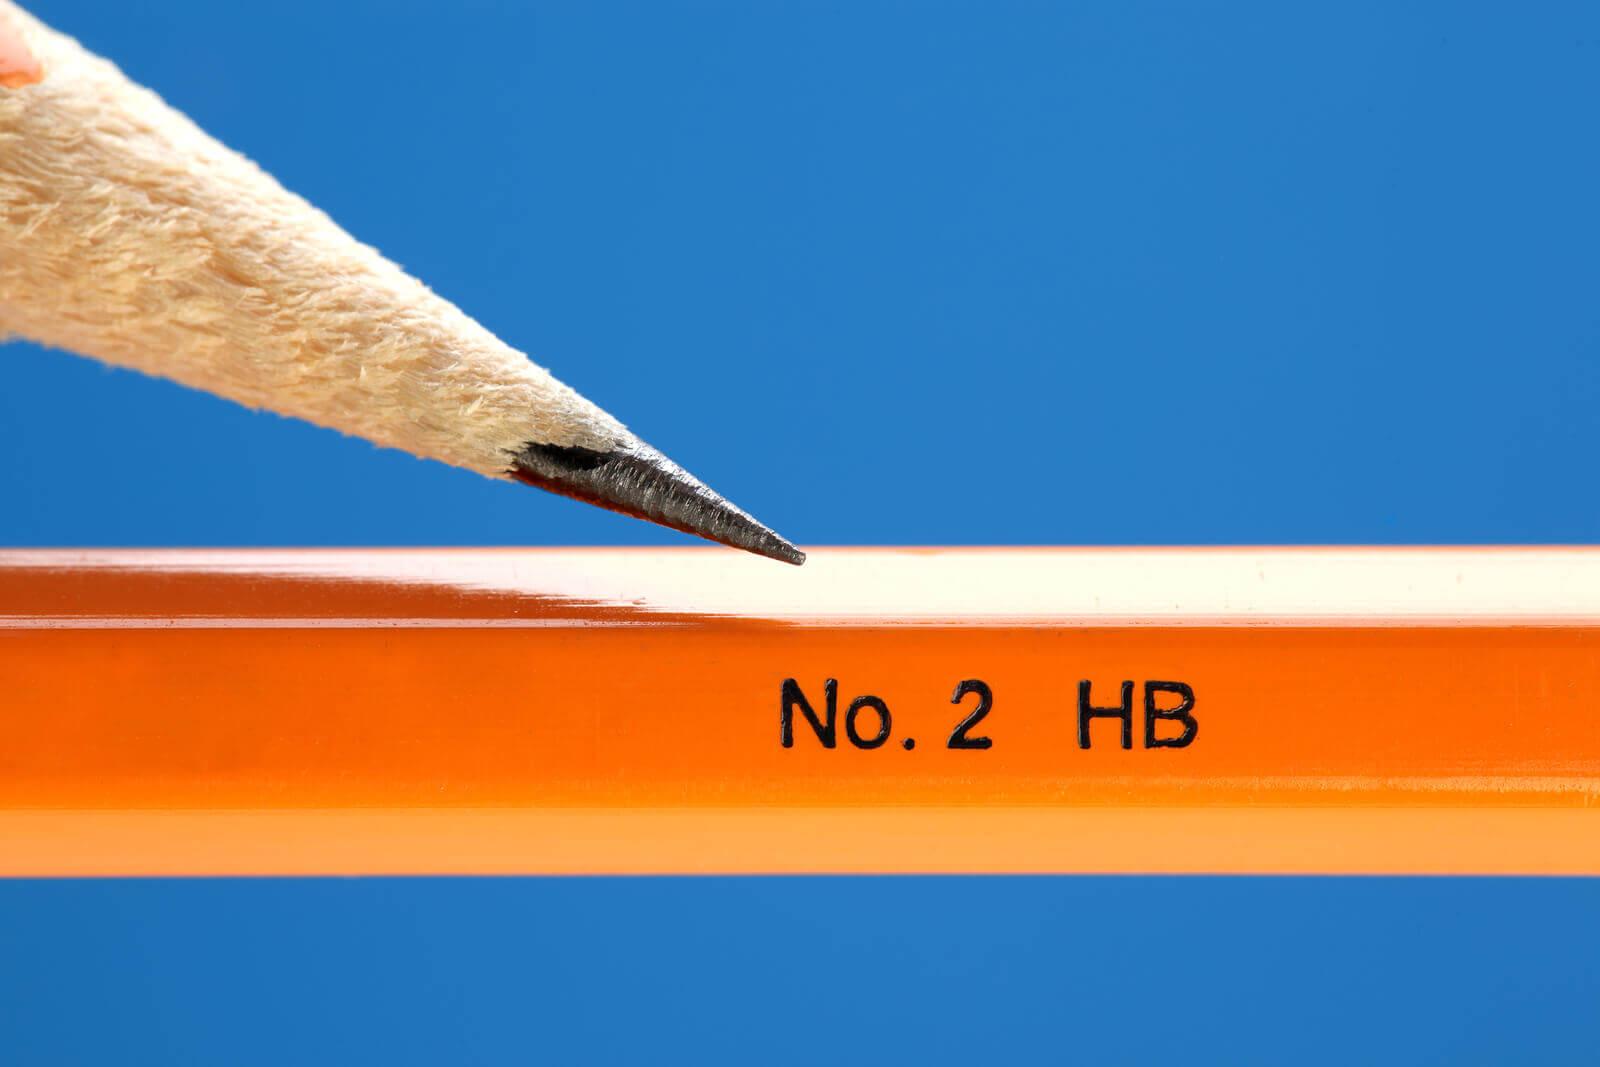 the pen company